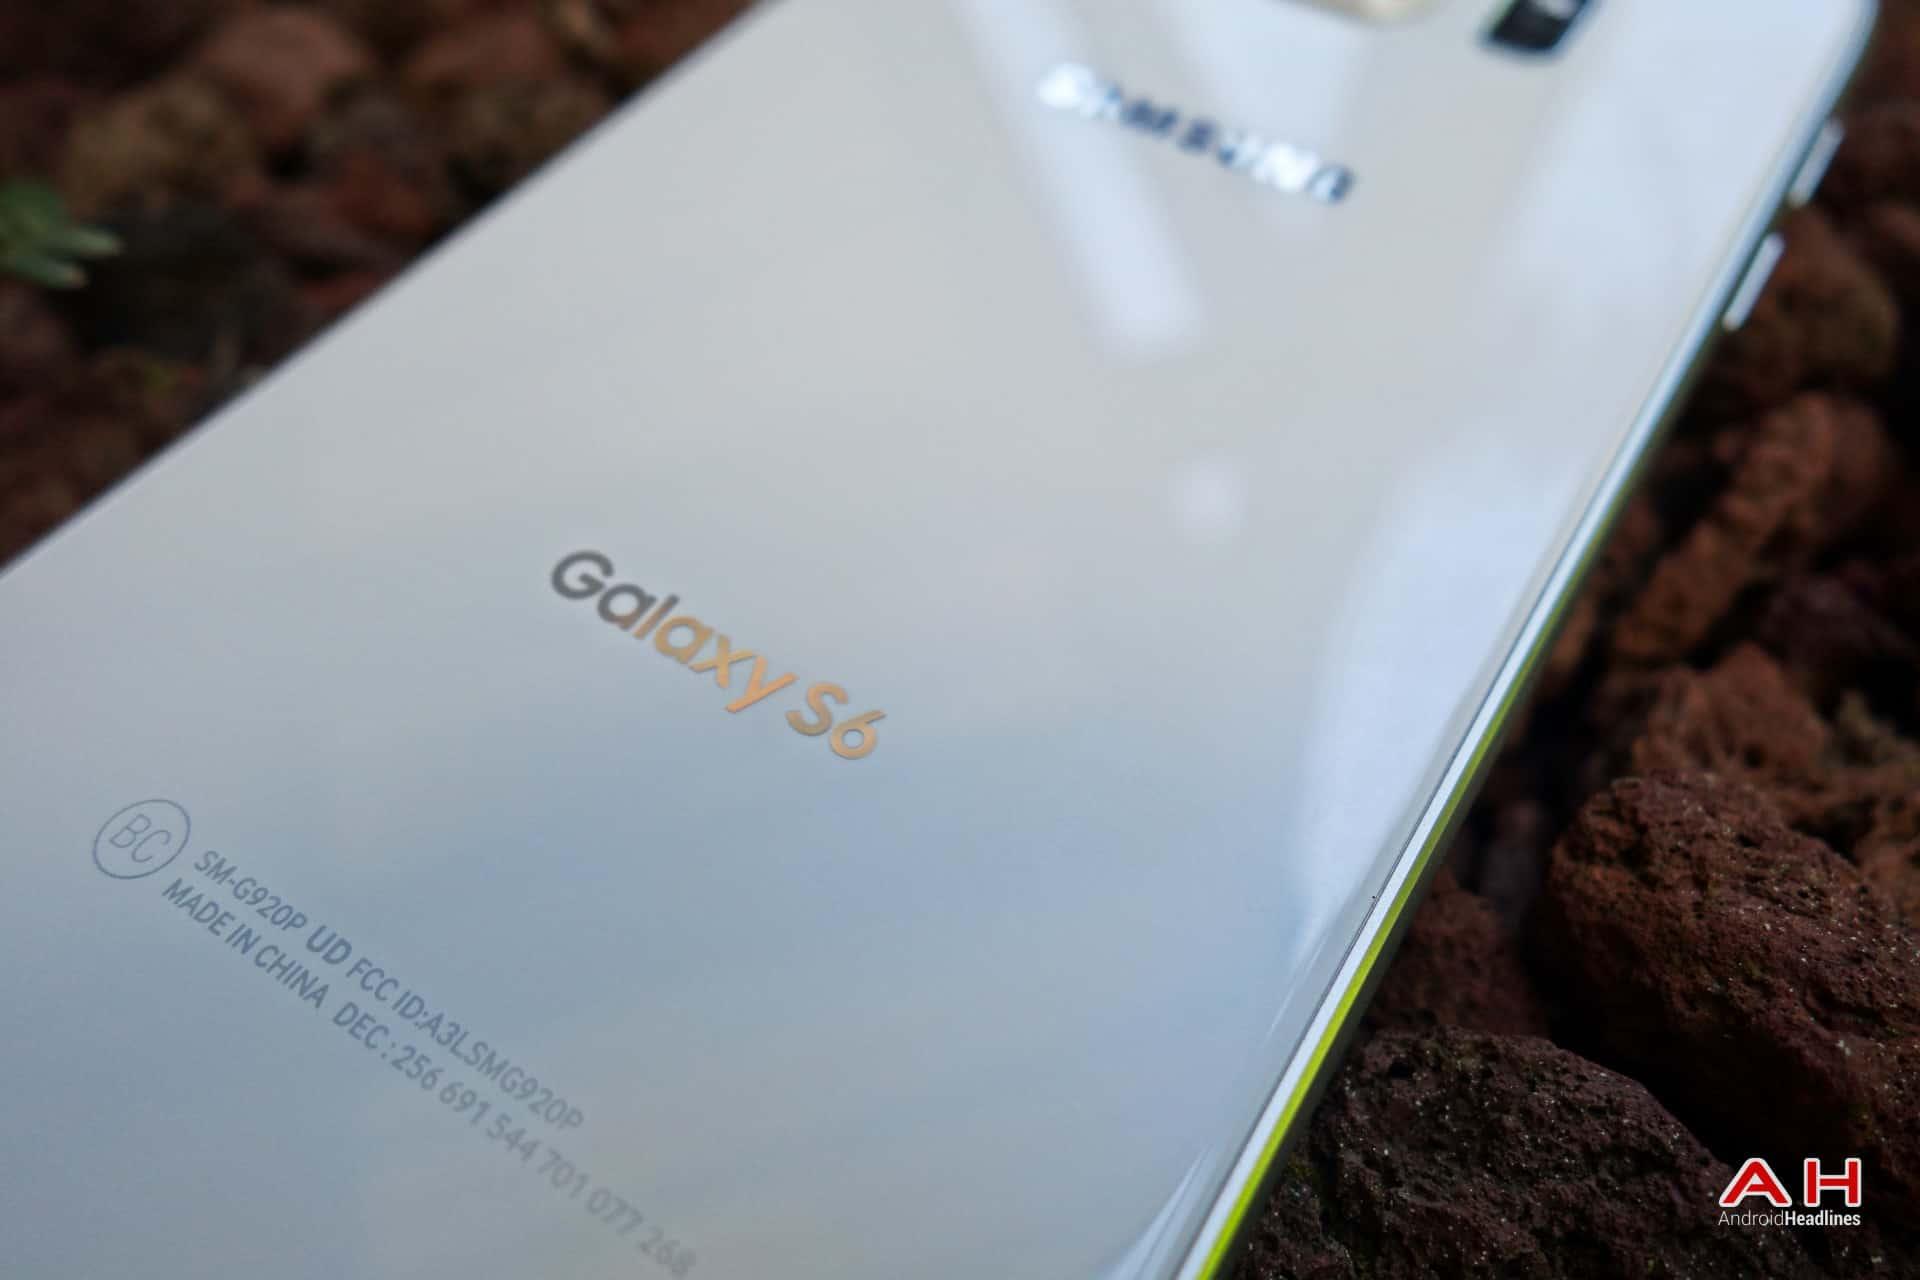 AH Samsung Galaxy S6 30